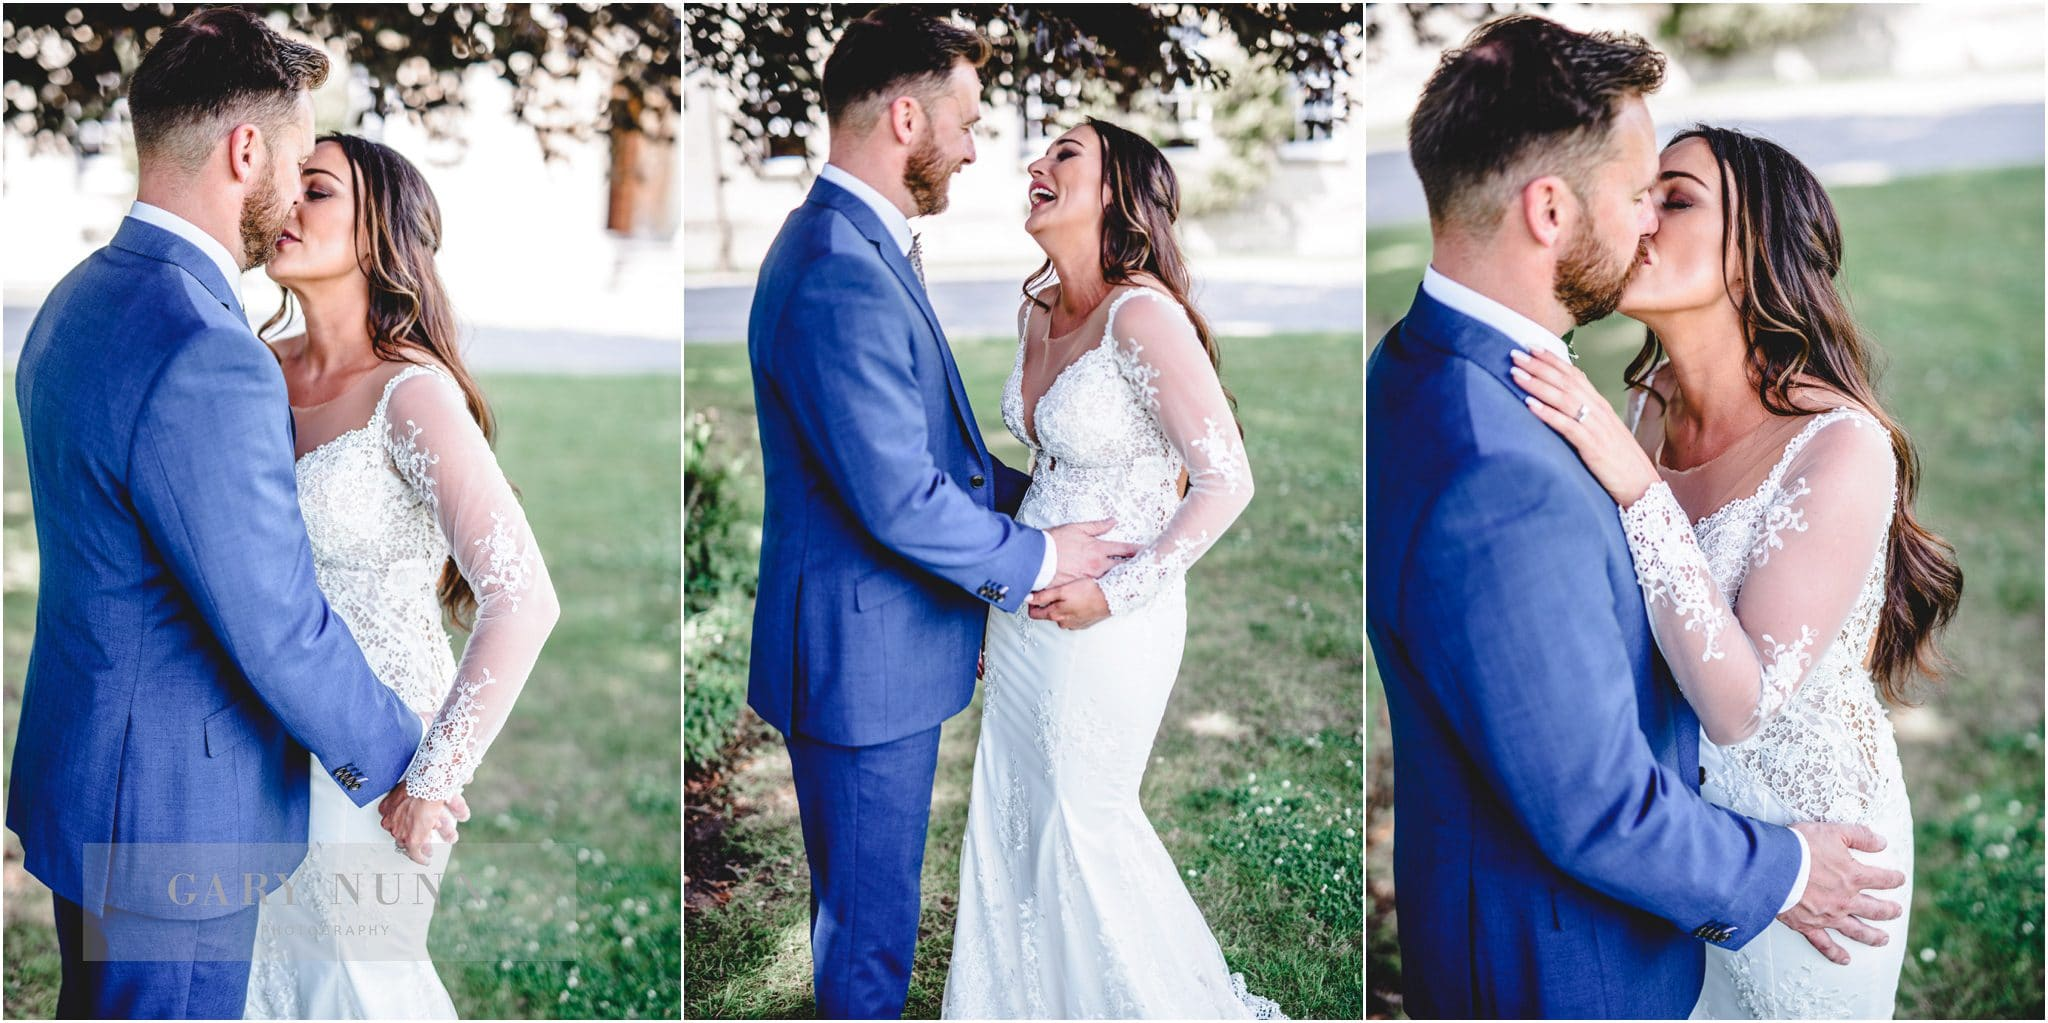 Elmore Court, elmore court weddings, Destination Wedding Photographer, wedding photographer Milton Keynes, Elmore Court